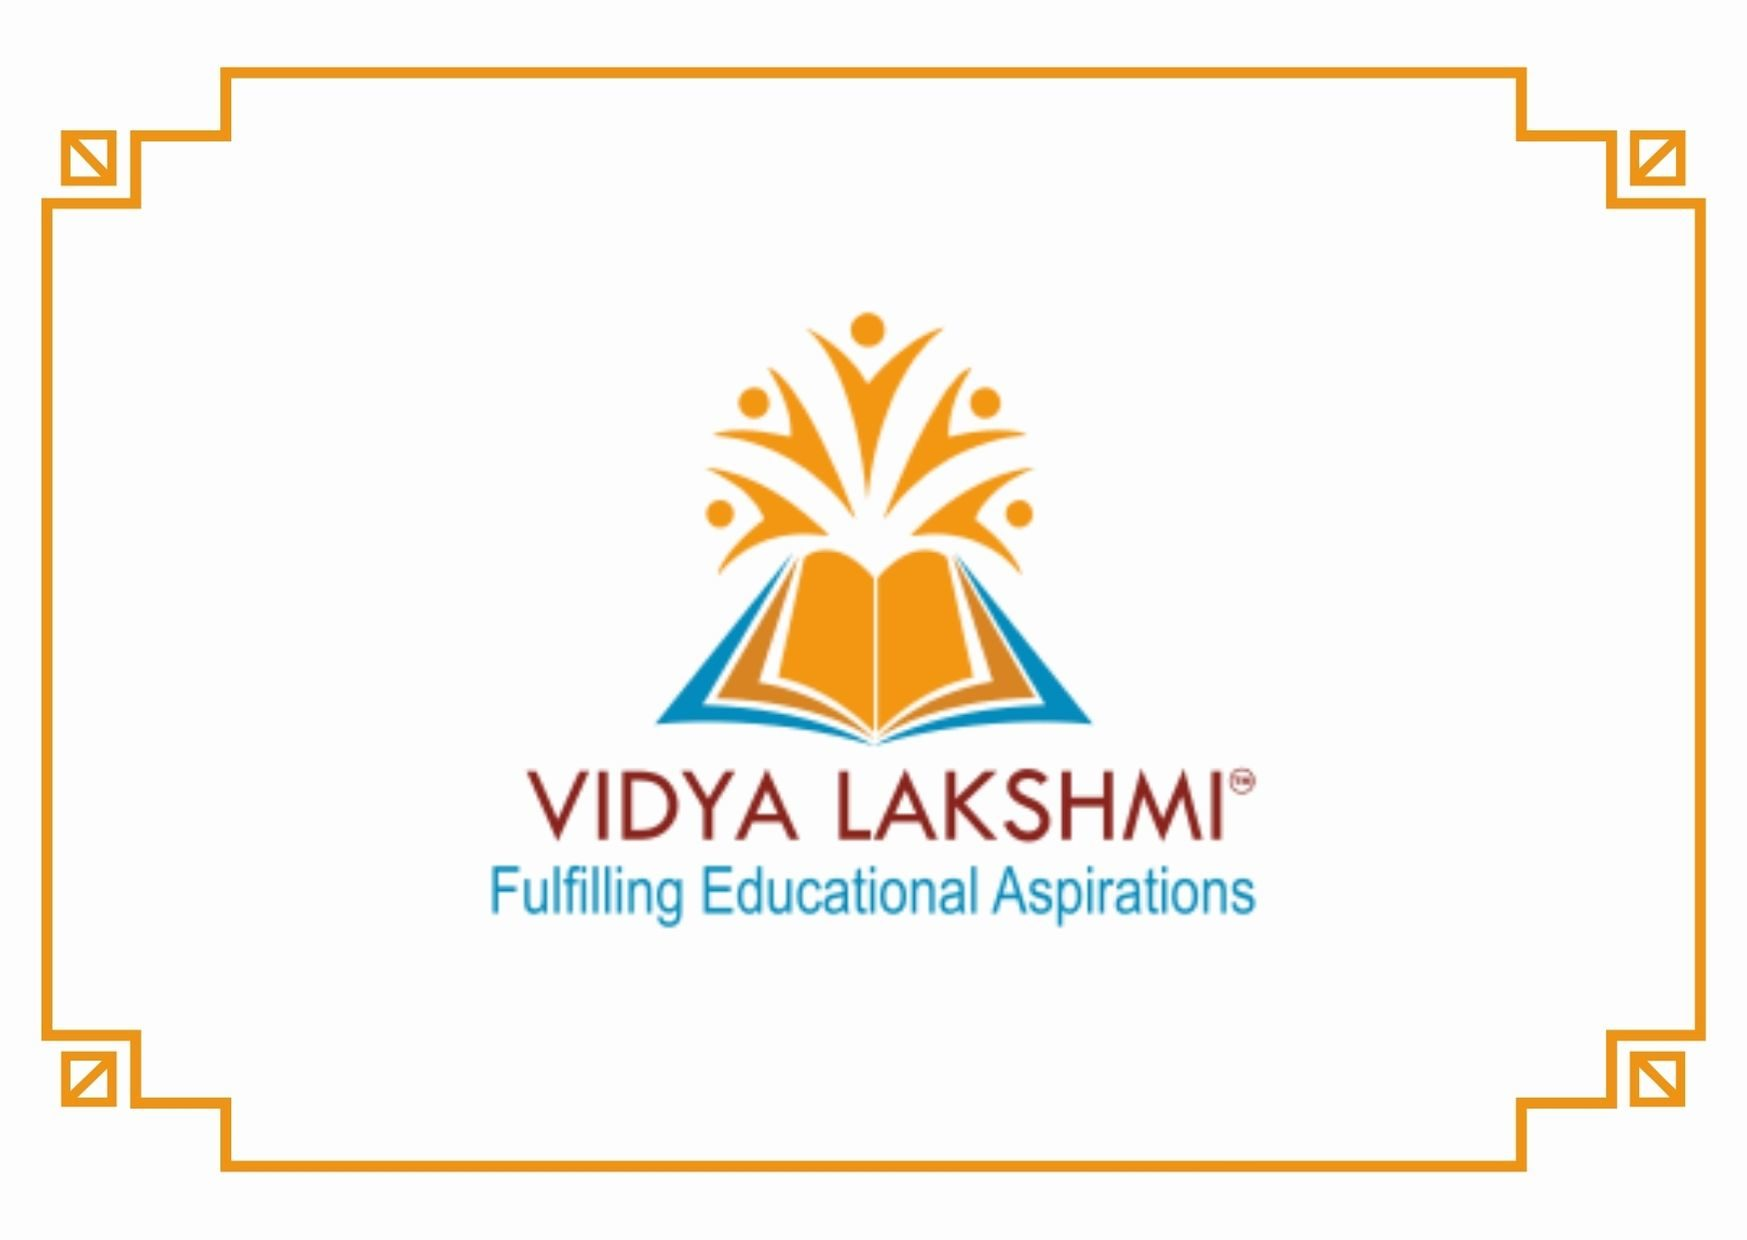 Vidya Lakshmi Portal Education Loan Eligibility, Features and Benefits